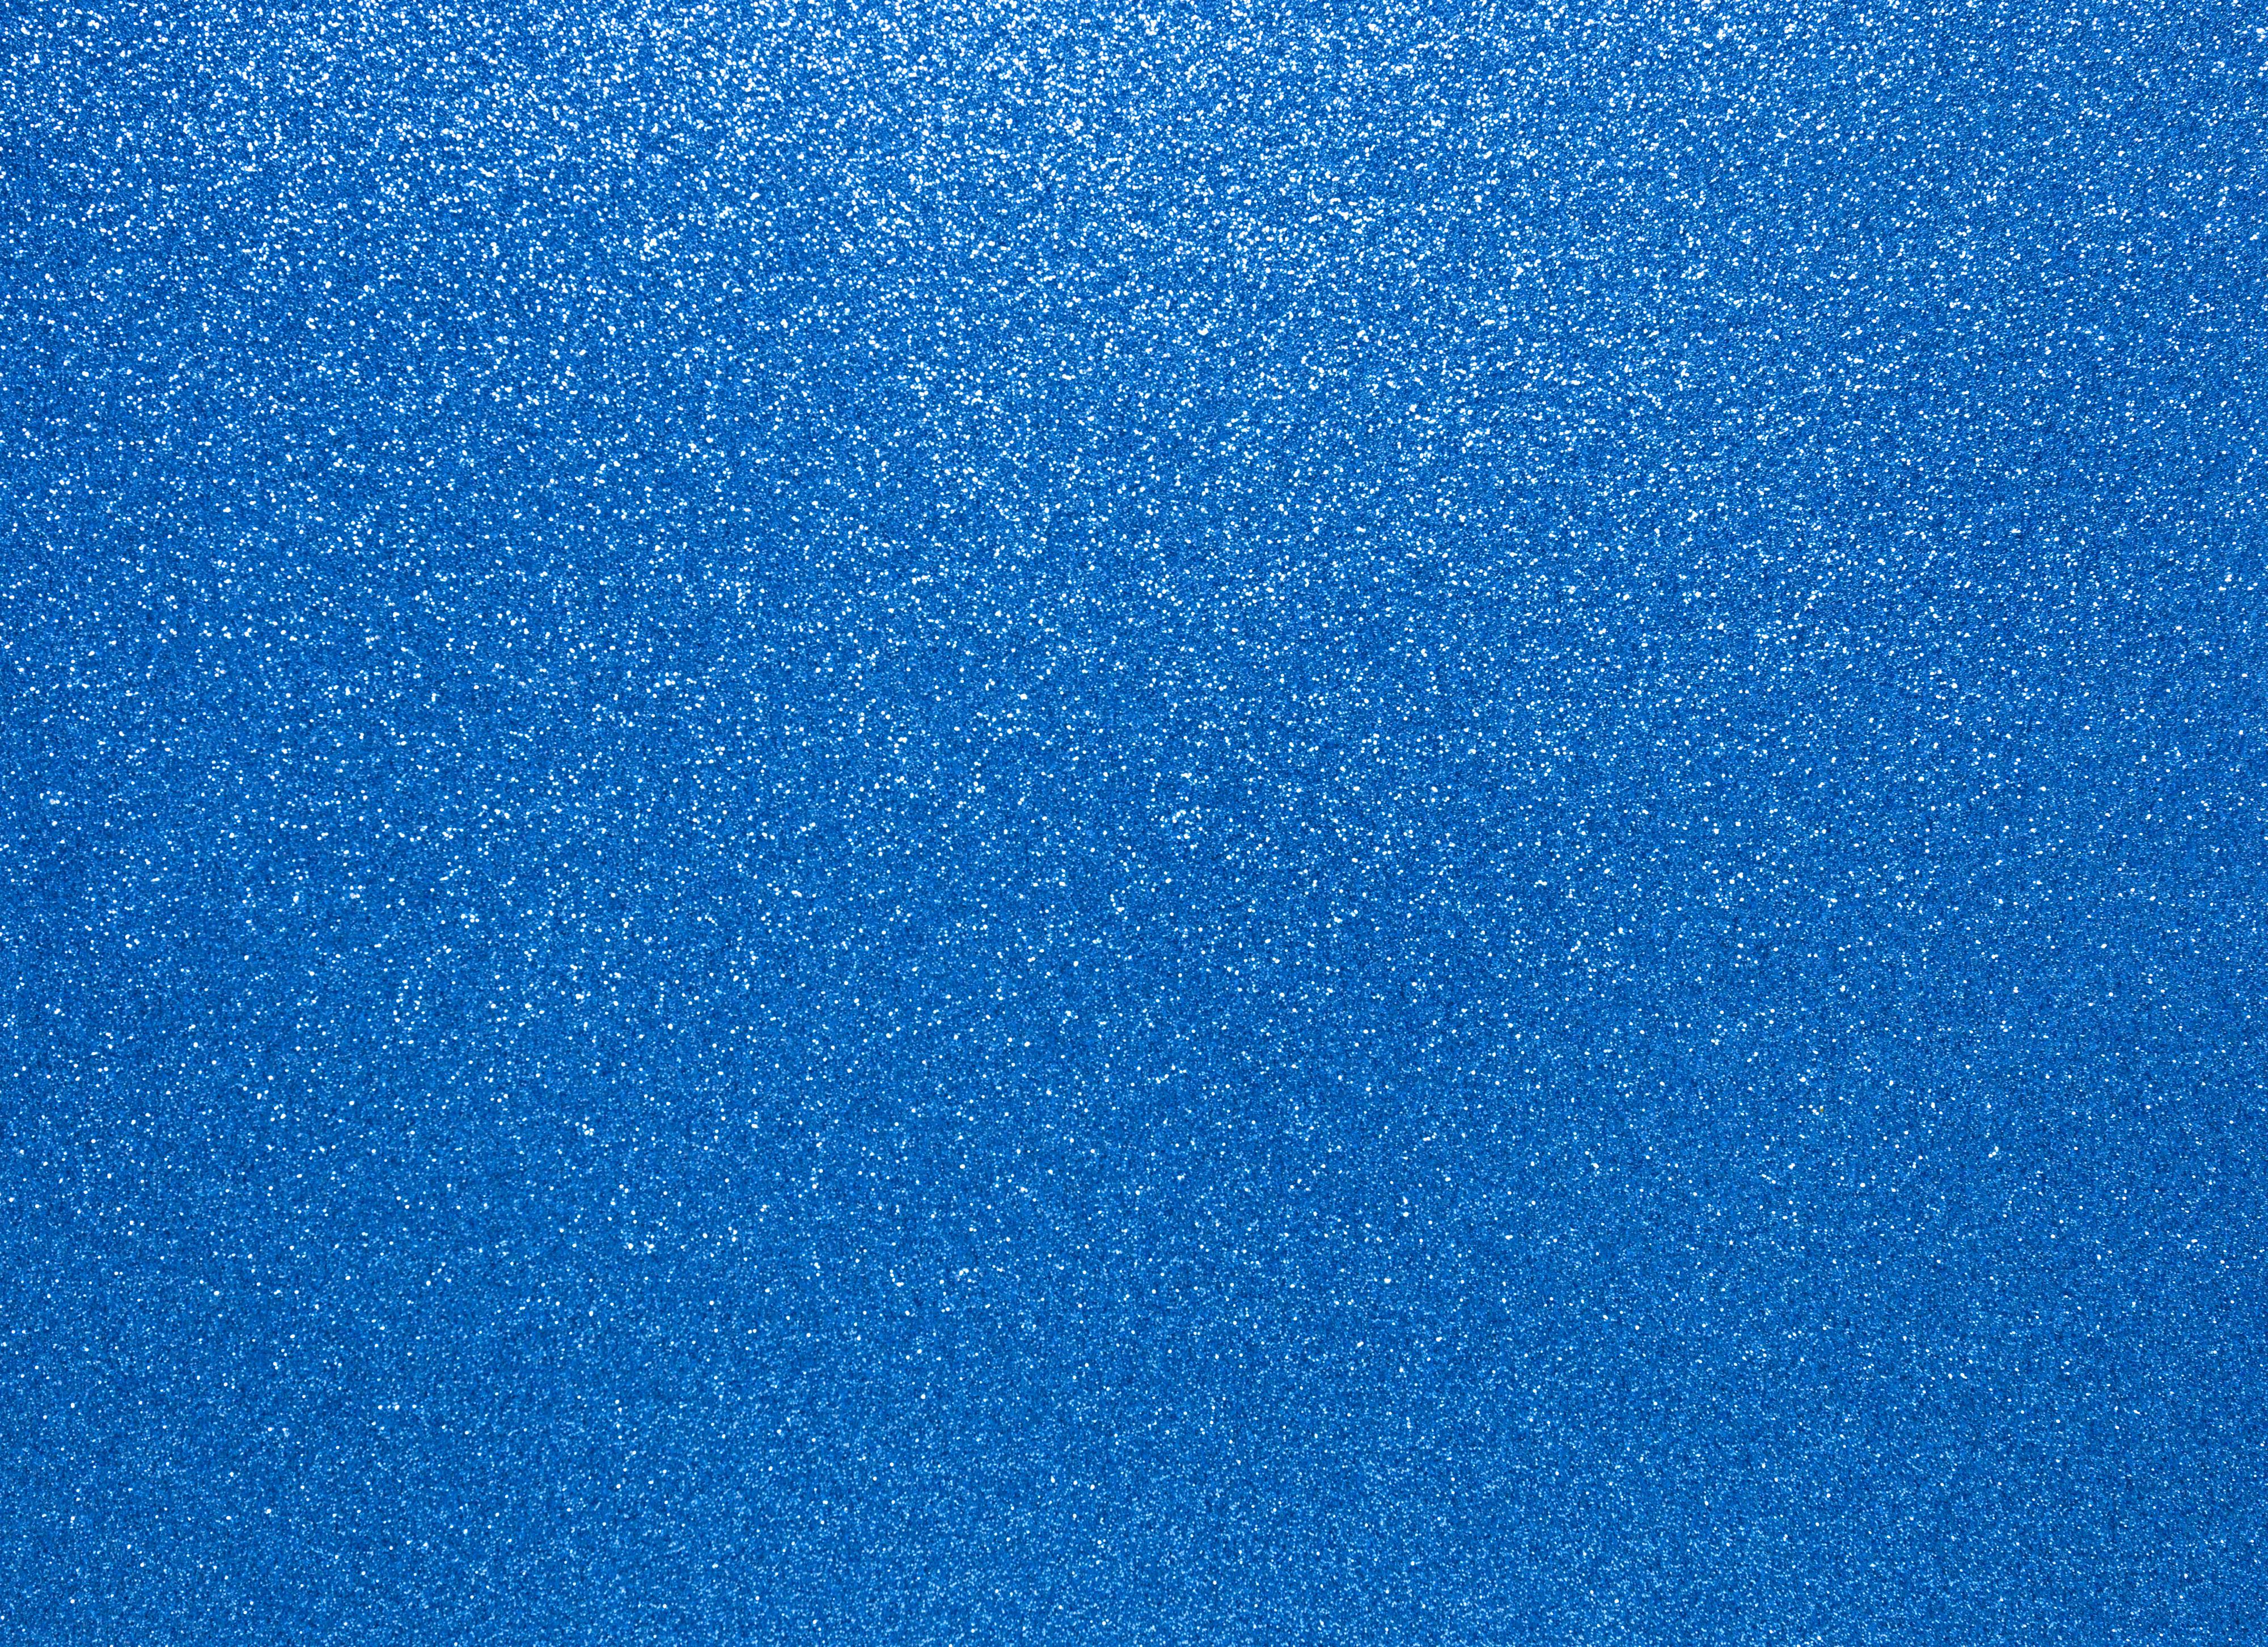 Glitter Background Blue.